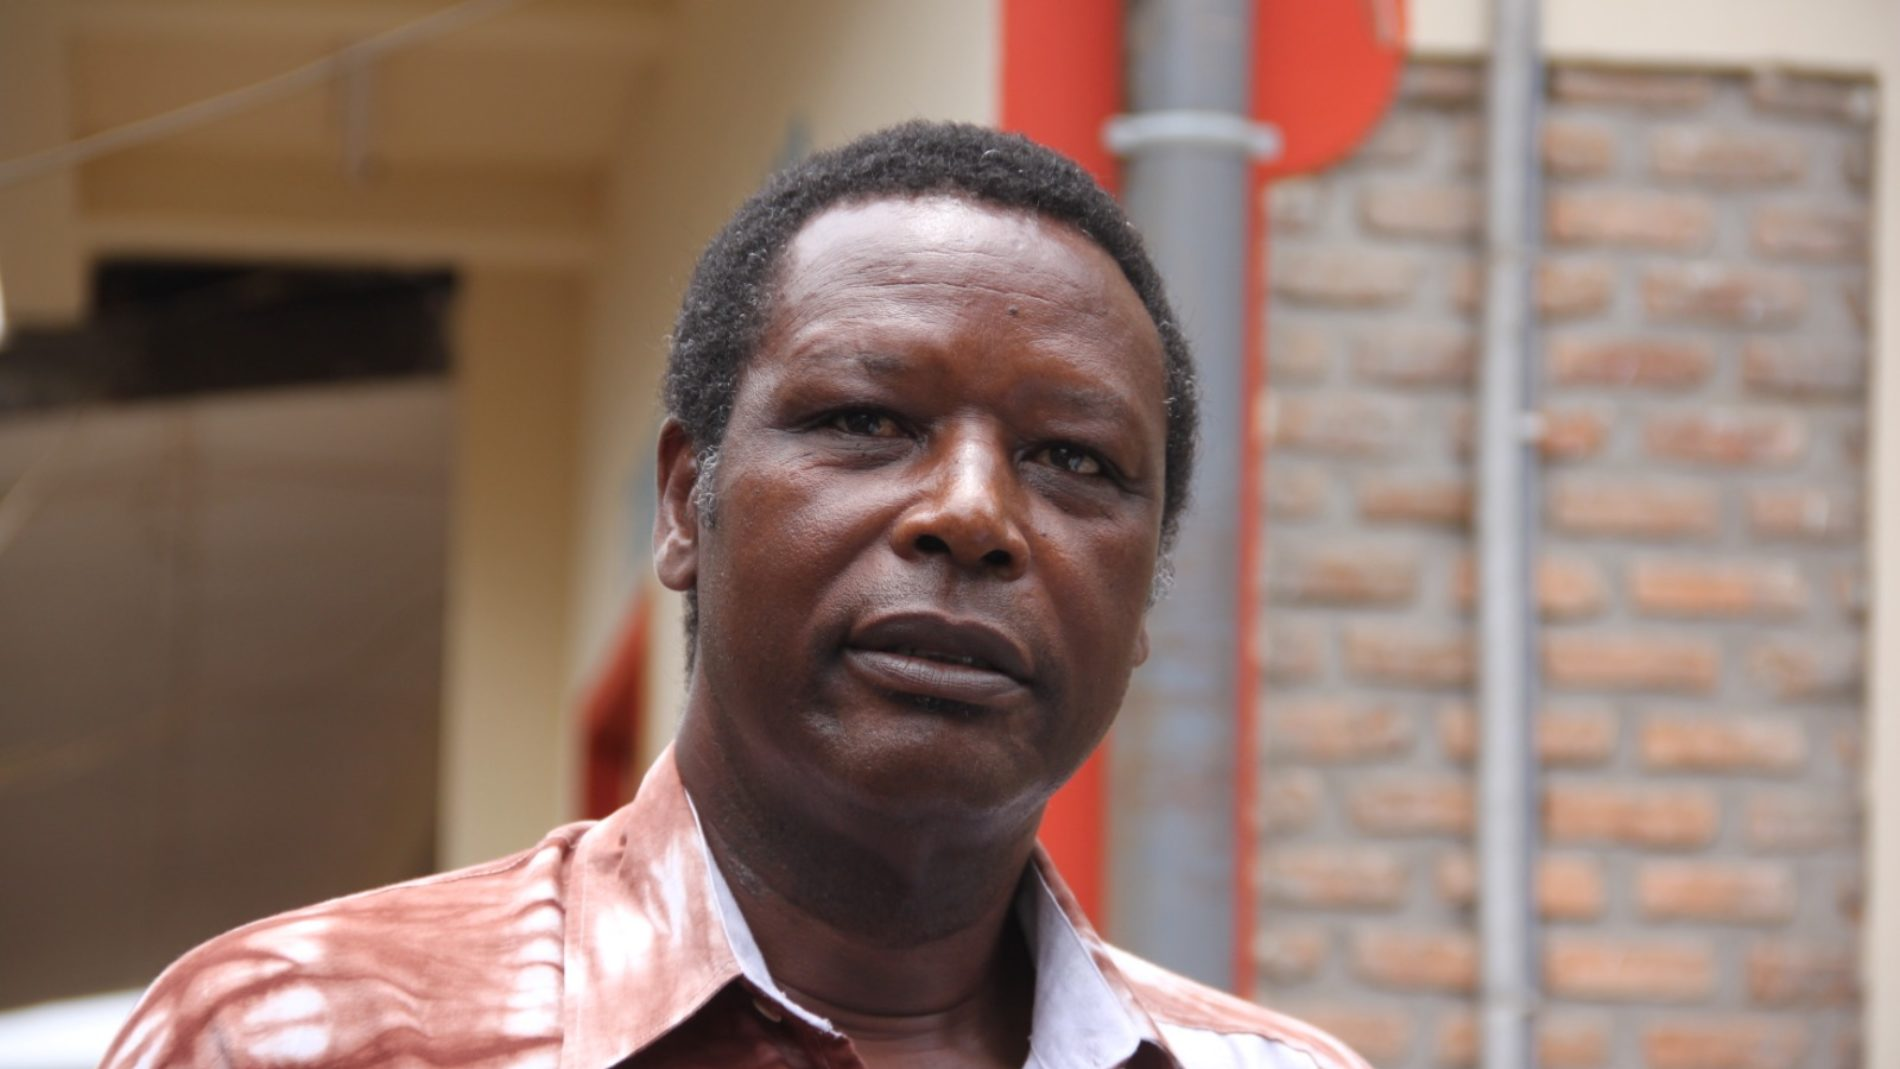 Pierre Buyoya « l'incompris » selon Frederic Bamvuginyumvira (interview)